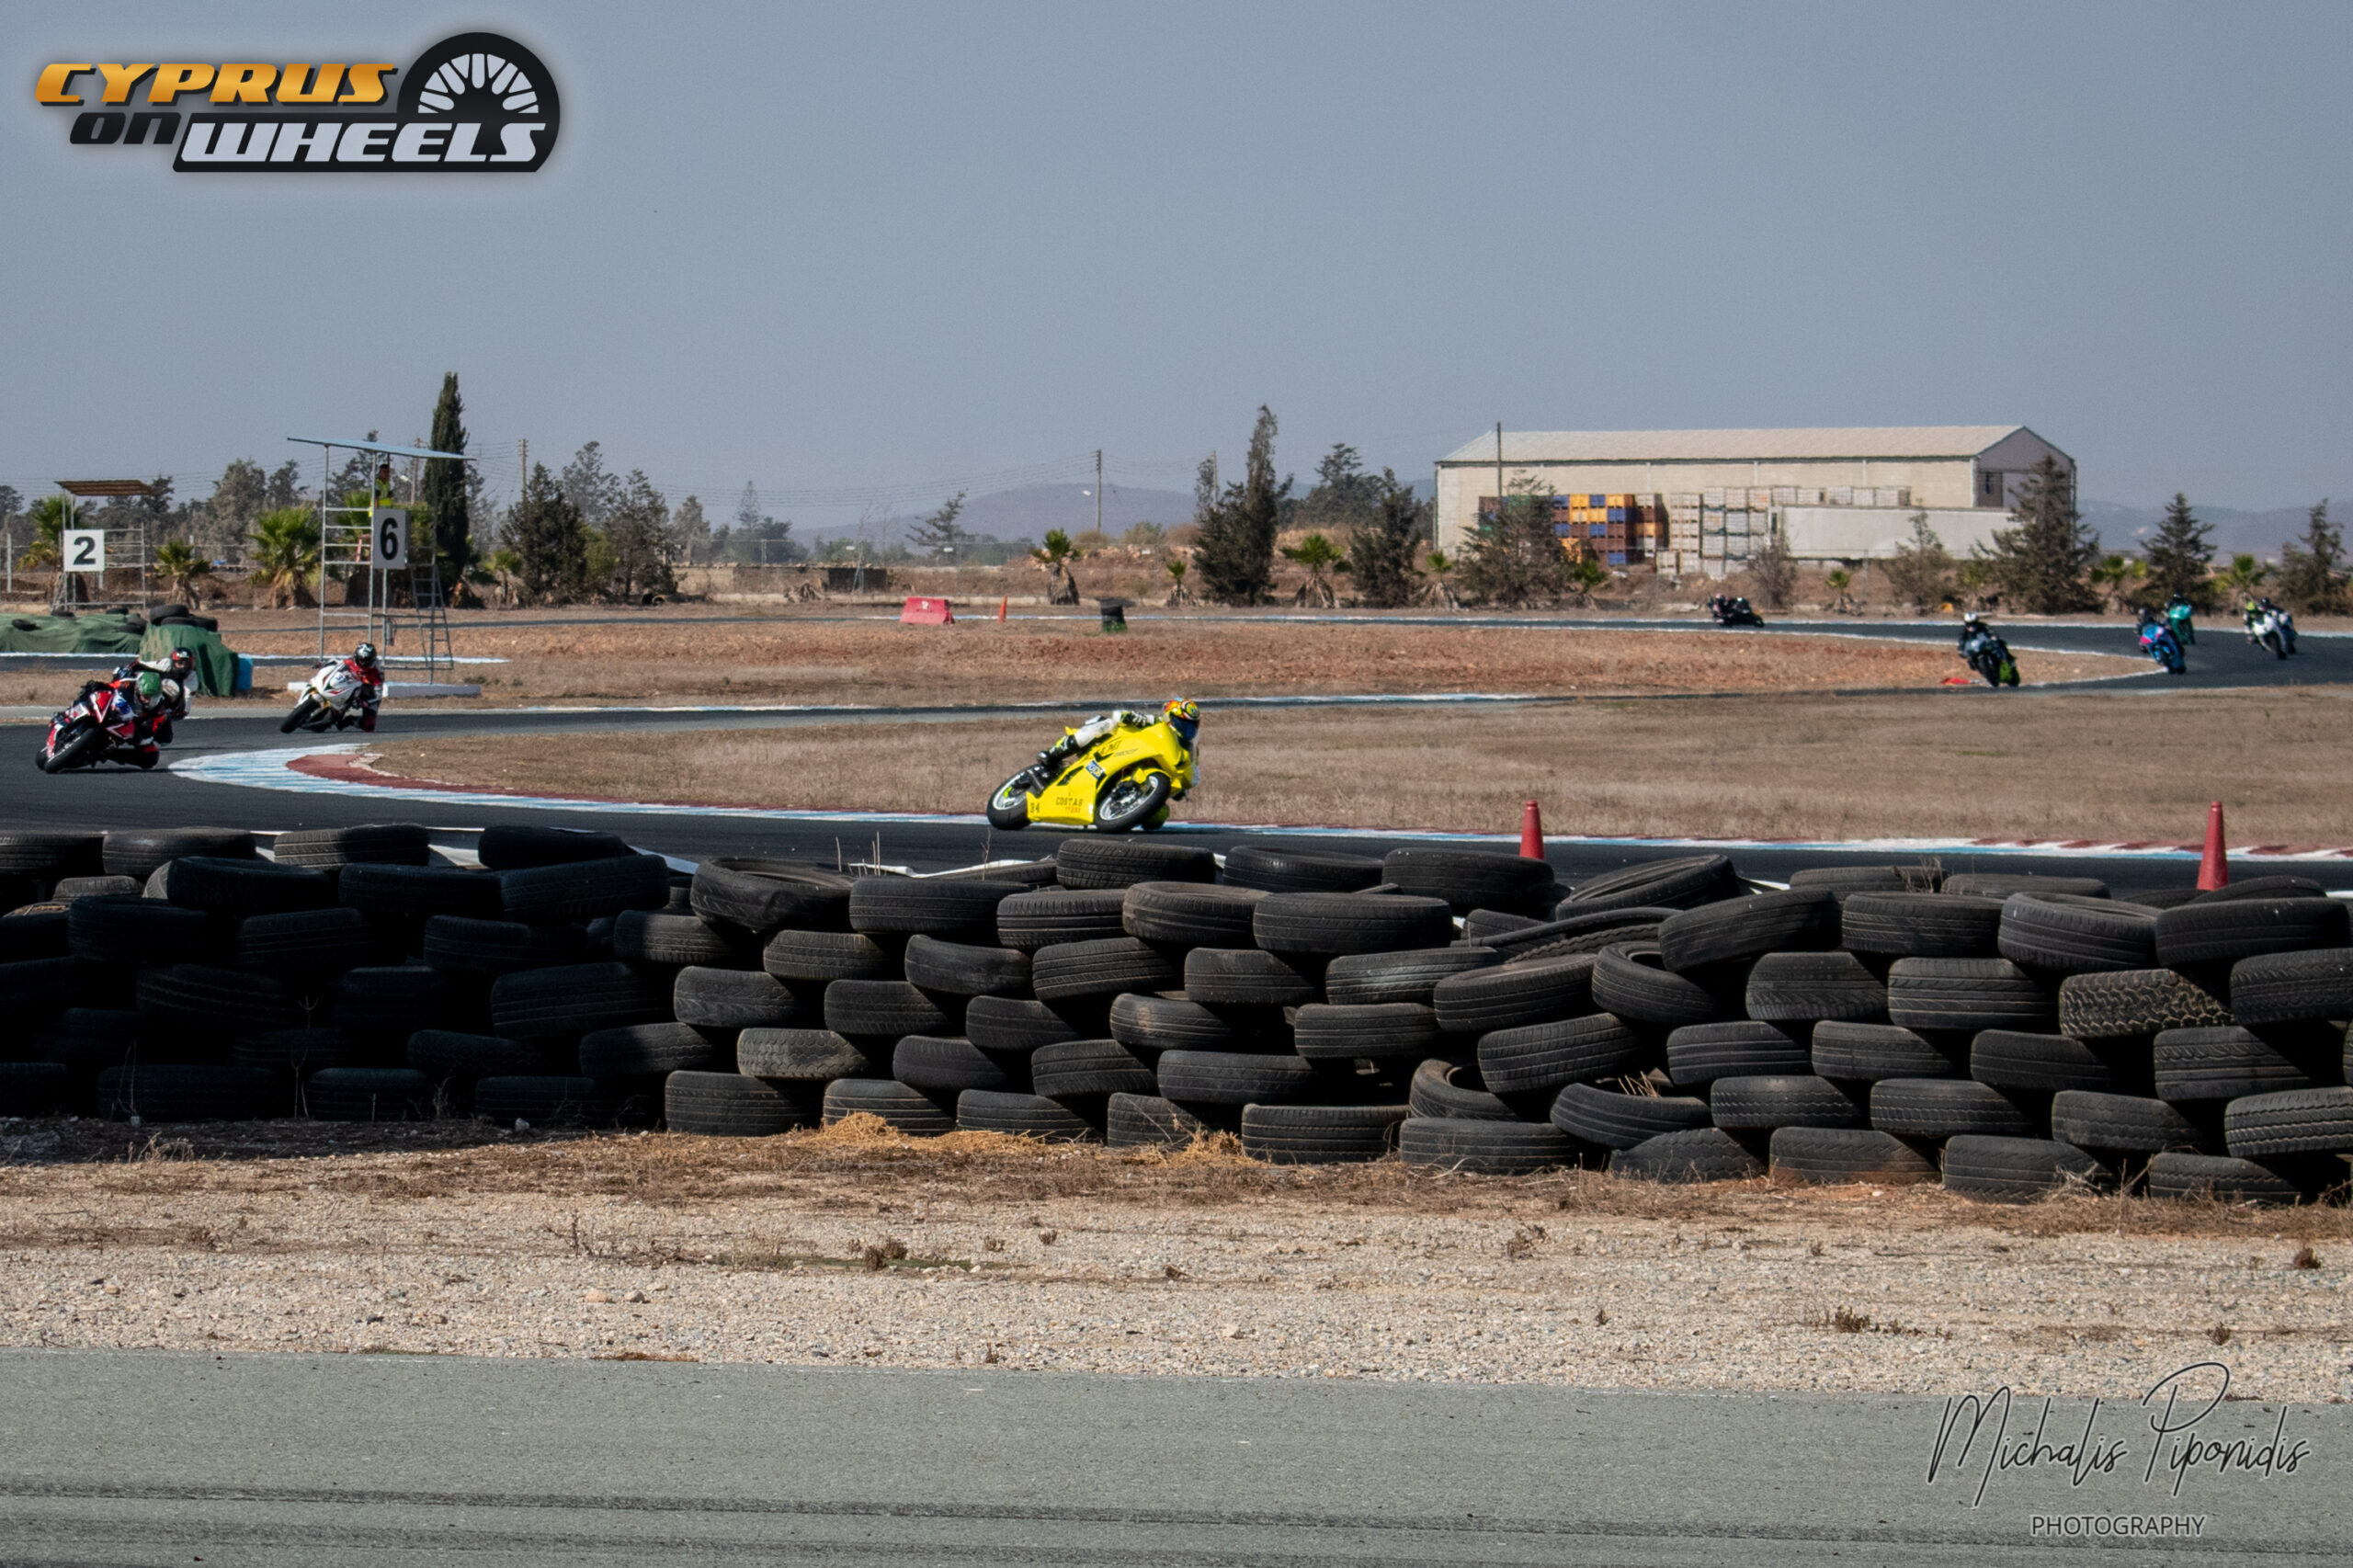 Yellow suzuki gsxr racing